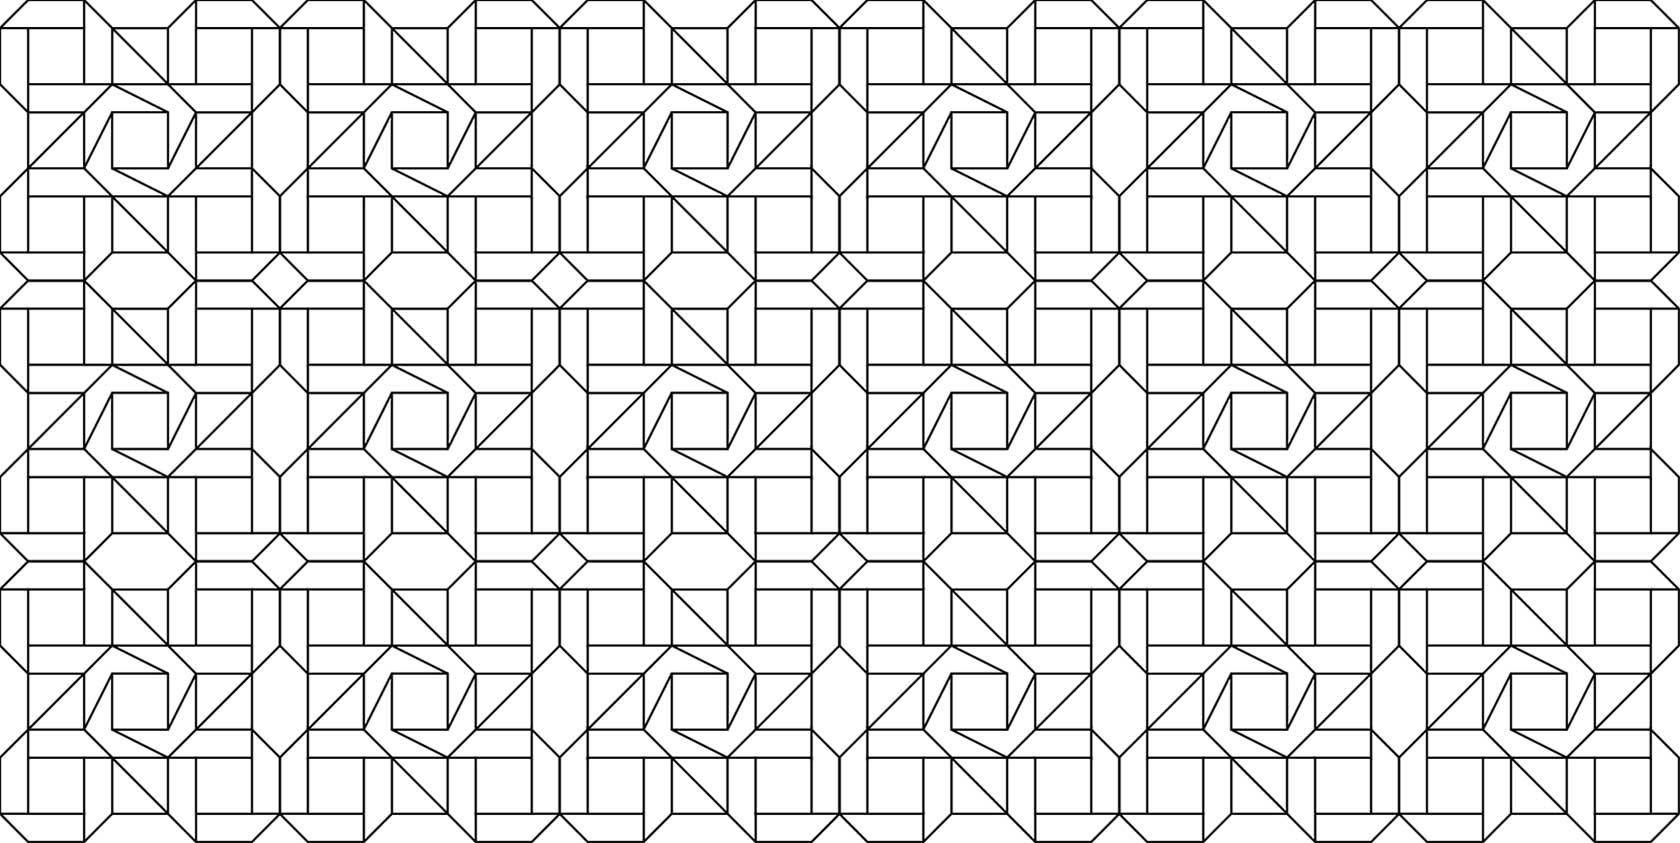 Alquemy Brand Identity Design Pattern3 by Furia